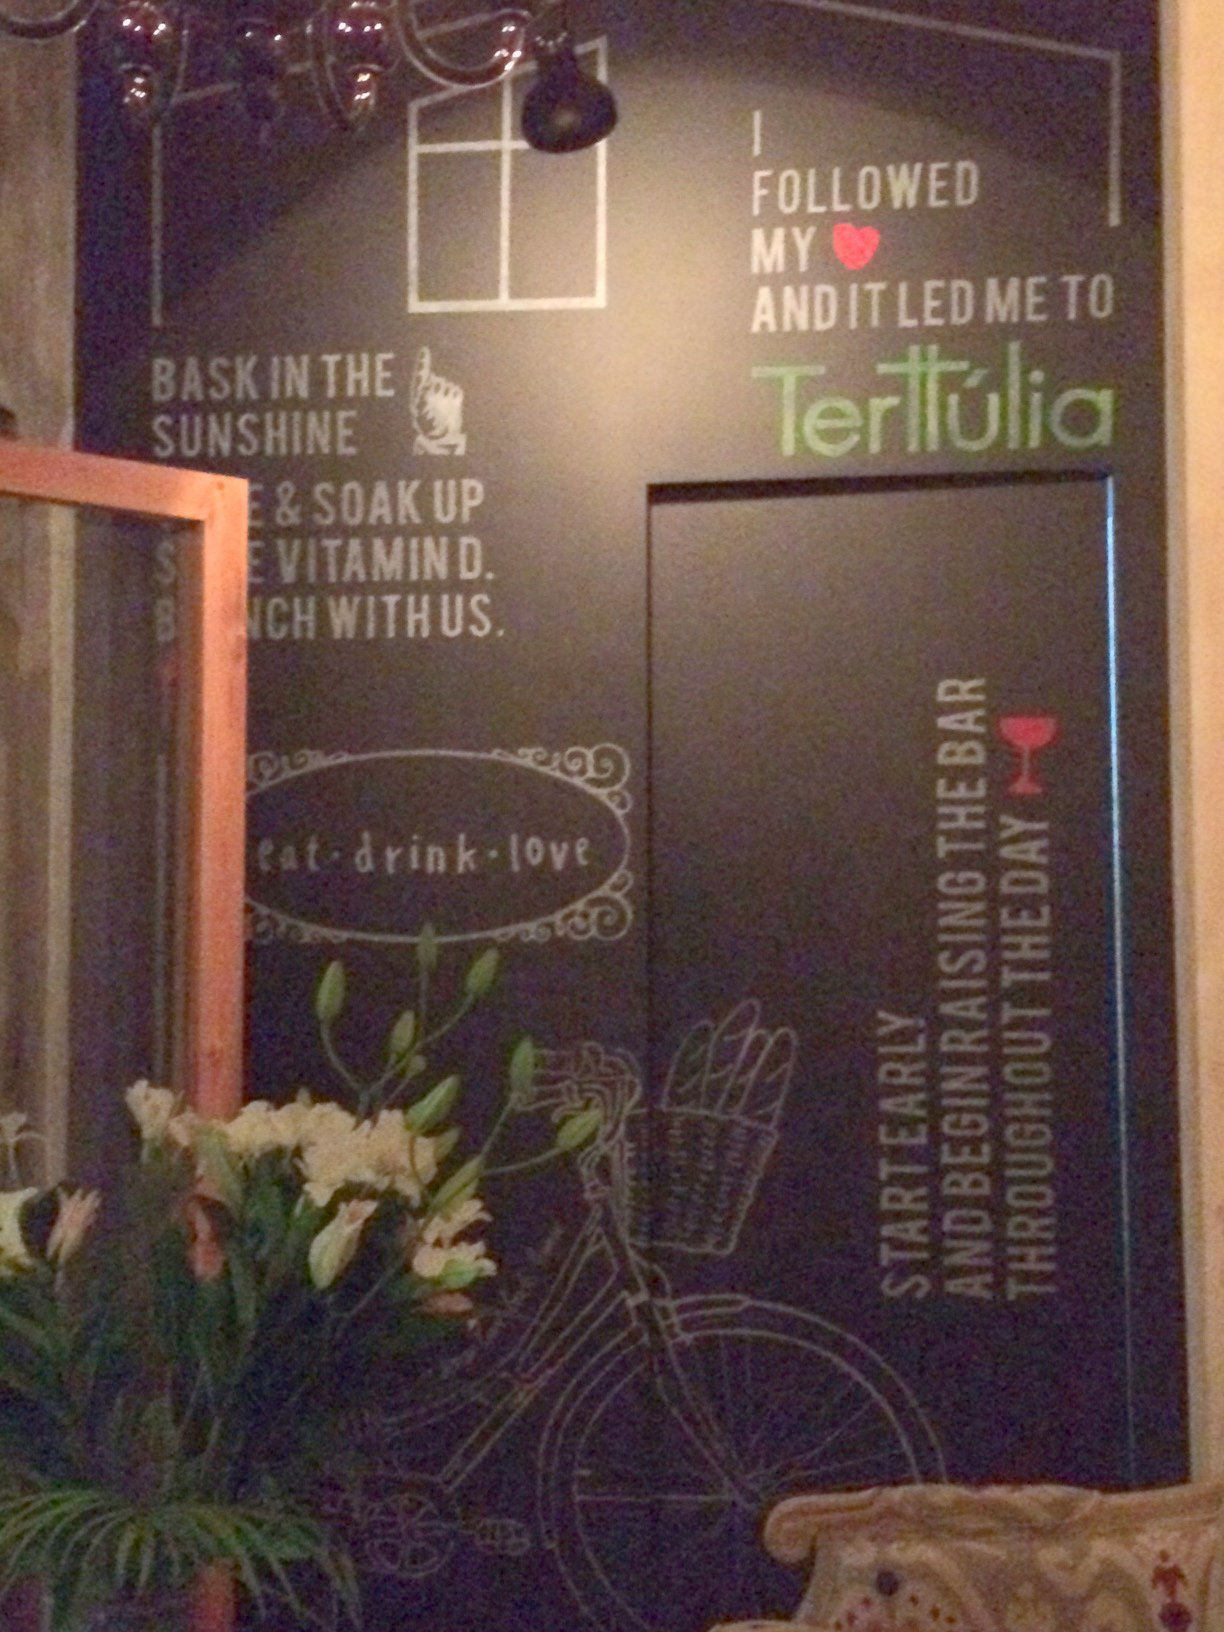 Terttulia-Eat-drink-Love.jpg